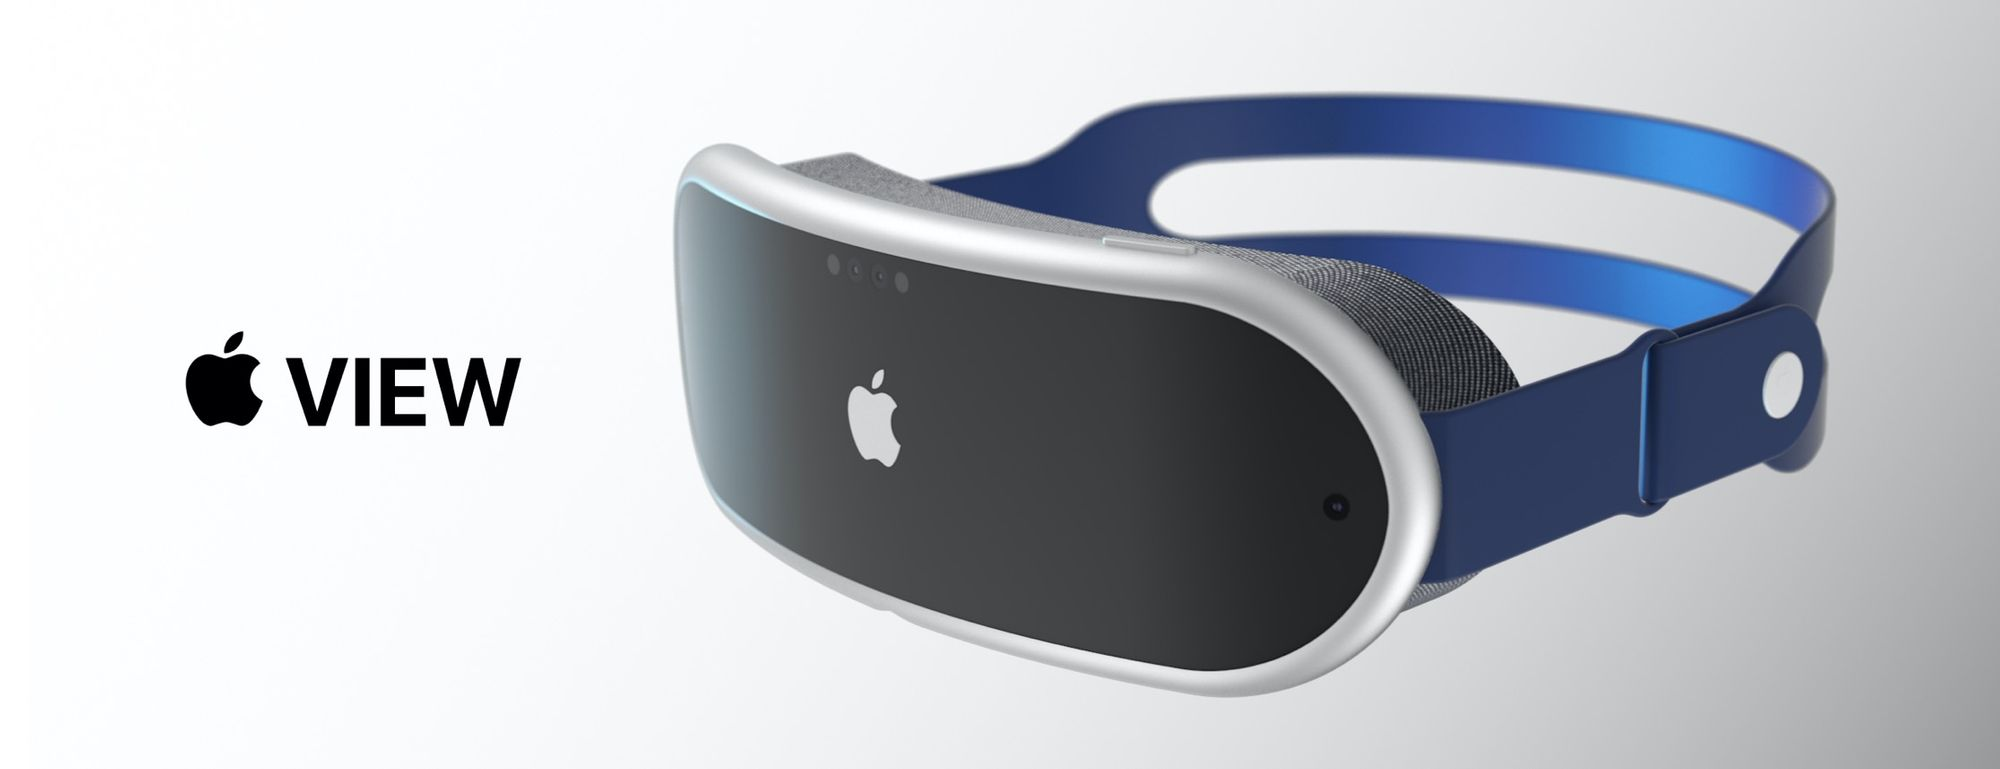 Vista frontal do Apple View